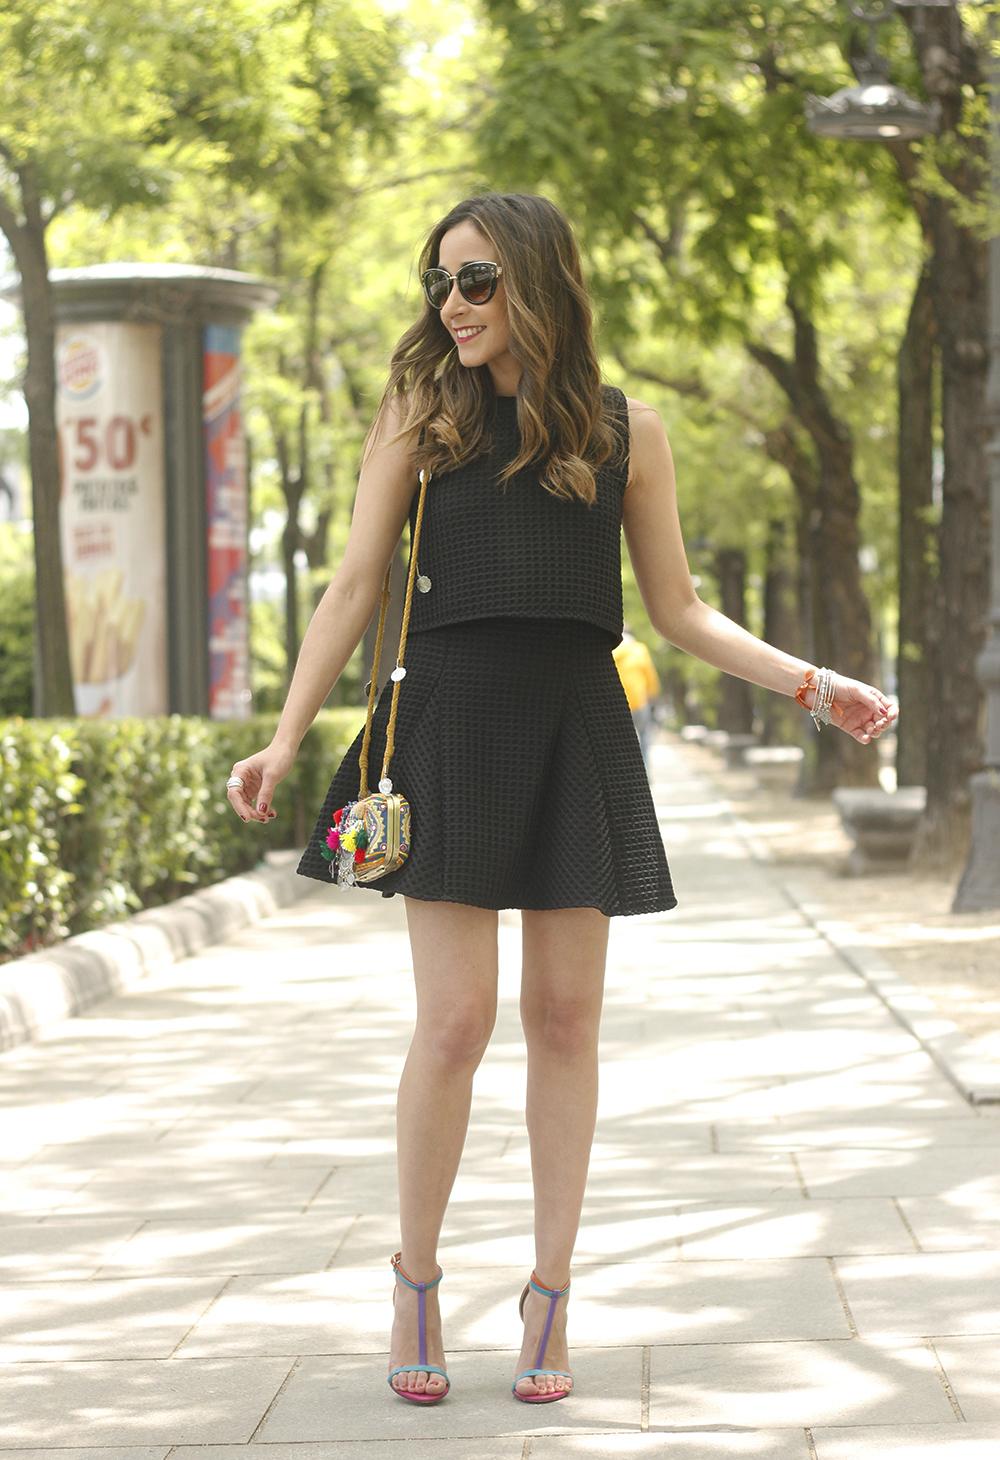 Little black dress maje carolina herrera sandals bag outfit fashion style summer sunnies03